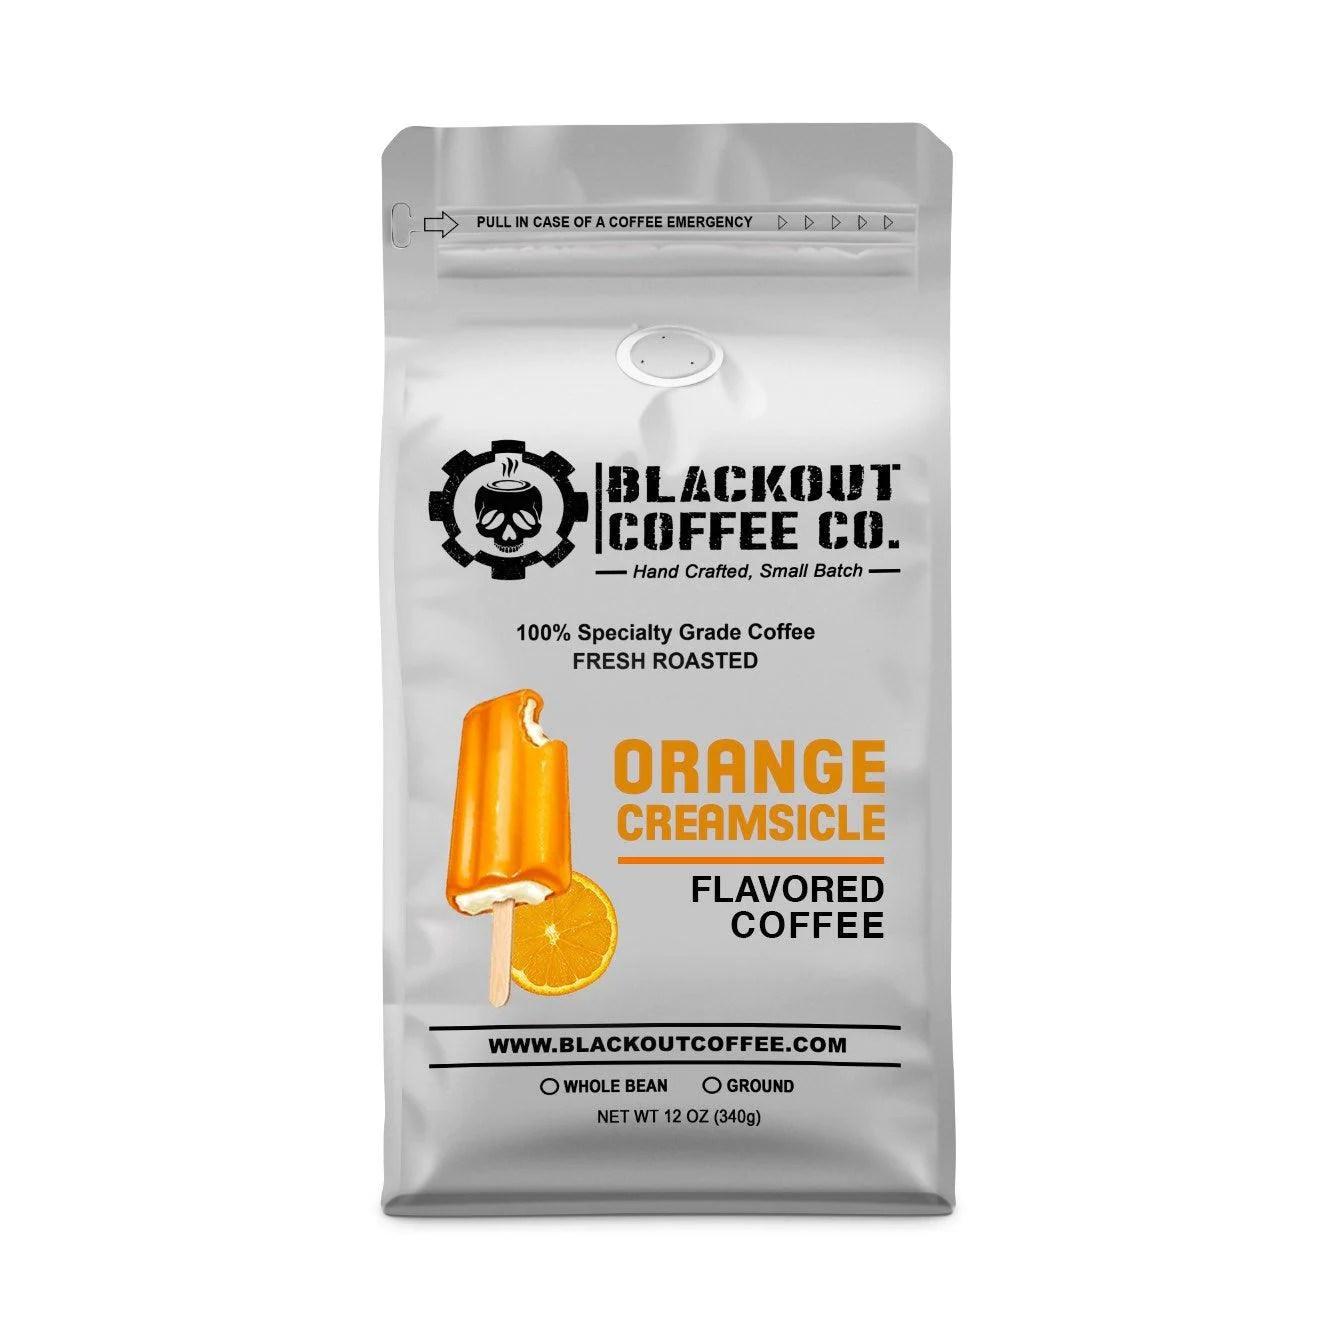 orange creamsicle flavored coffee